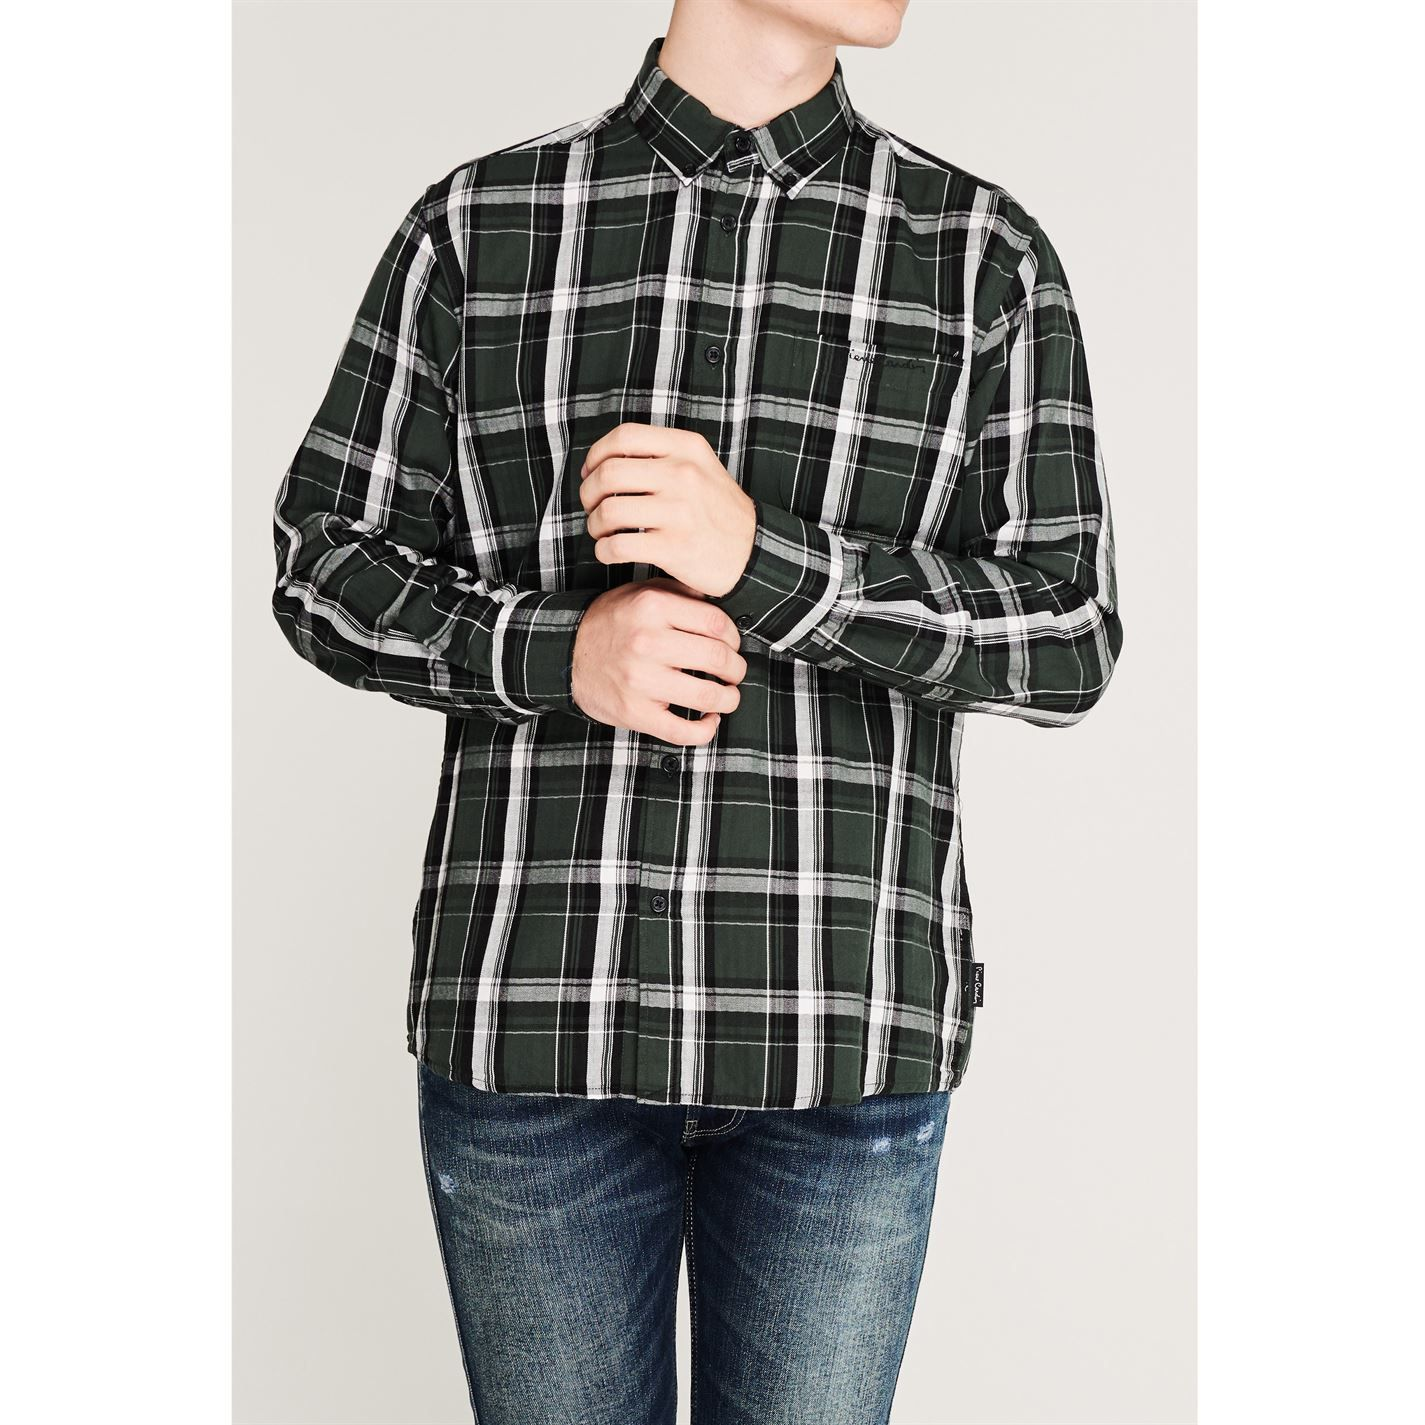 Pierre Cardin Mens Long Sleeve Twill Shirt Regular Fit